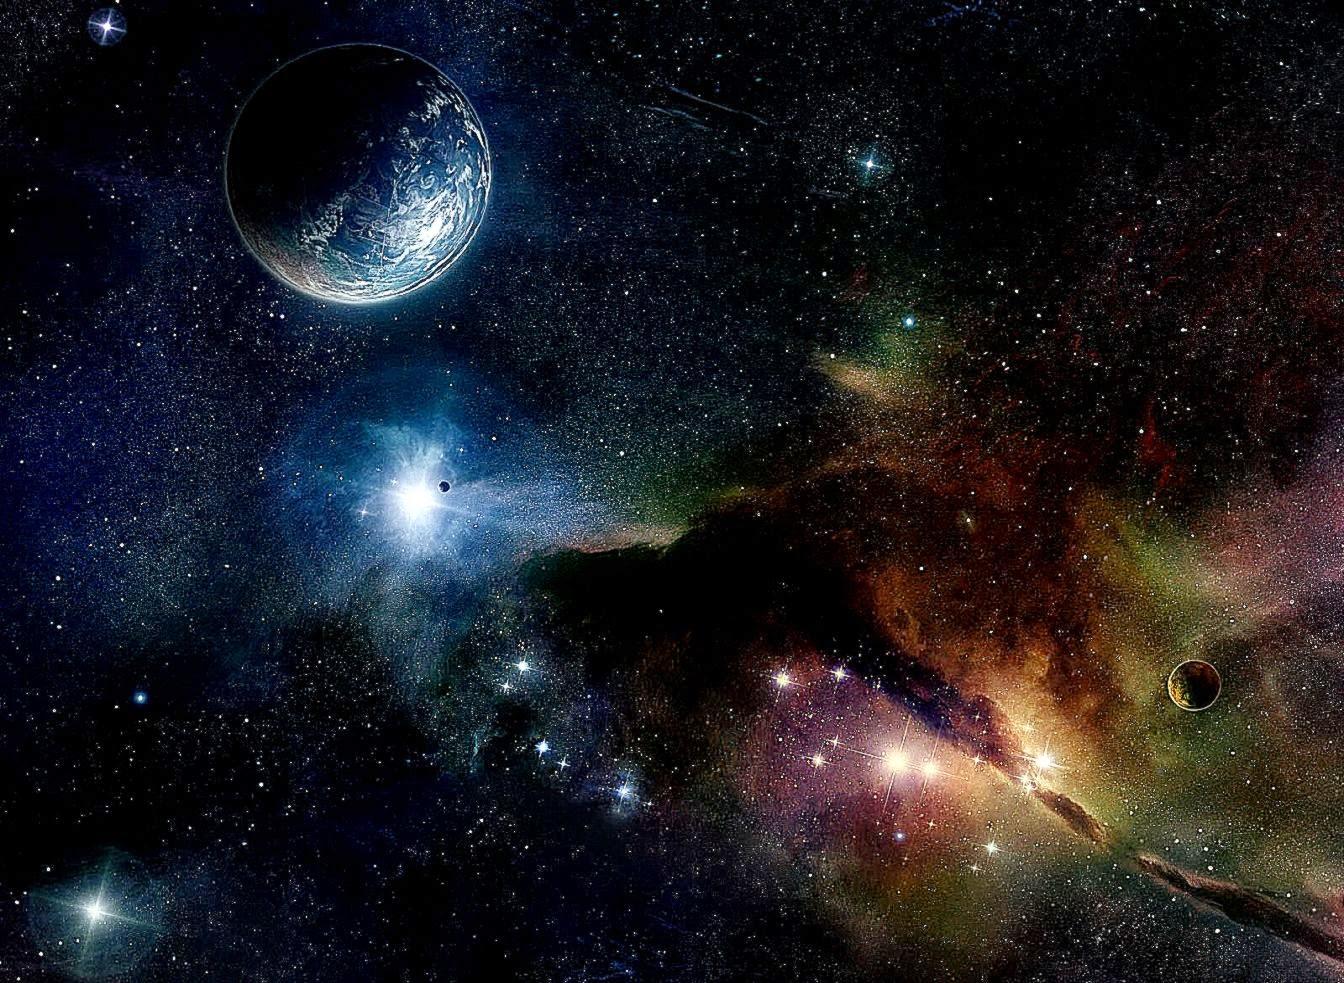 Cool Space Wallpaper 1719 1600x1200 px  HDWallSource